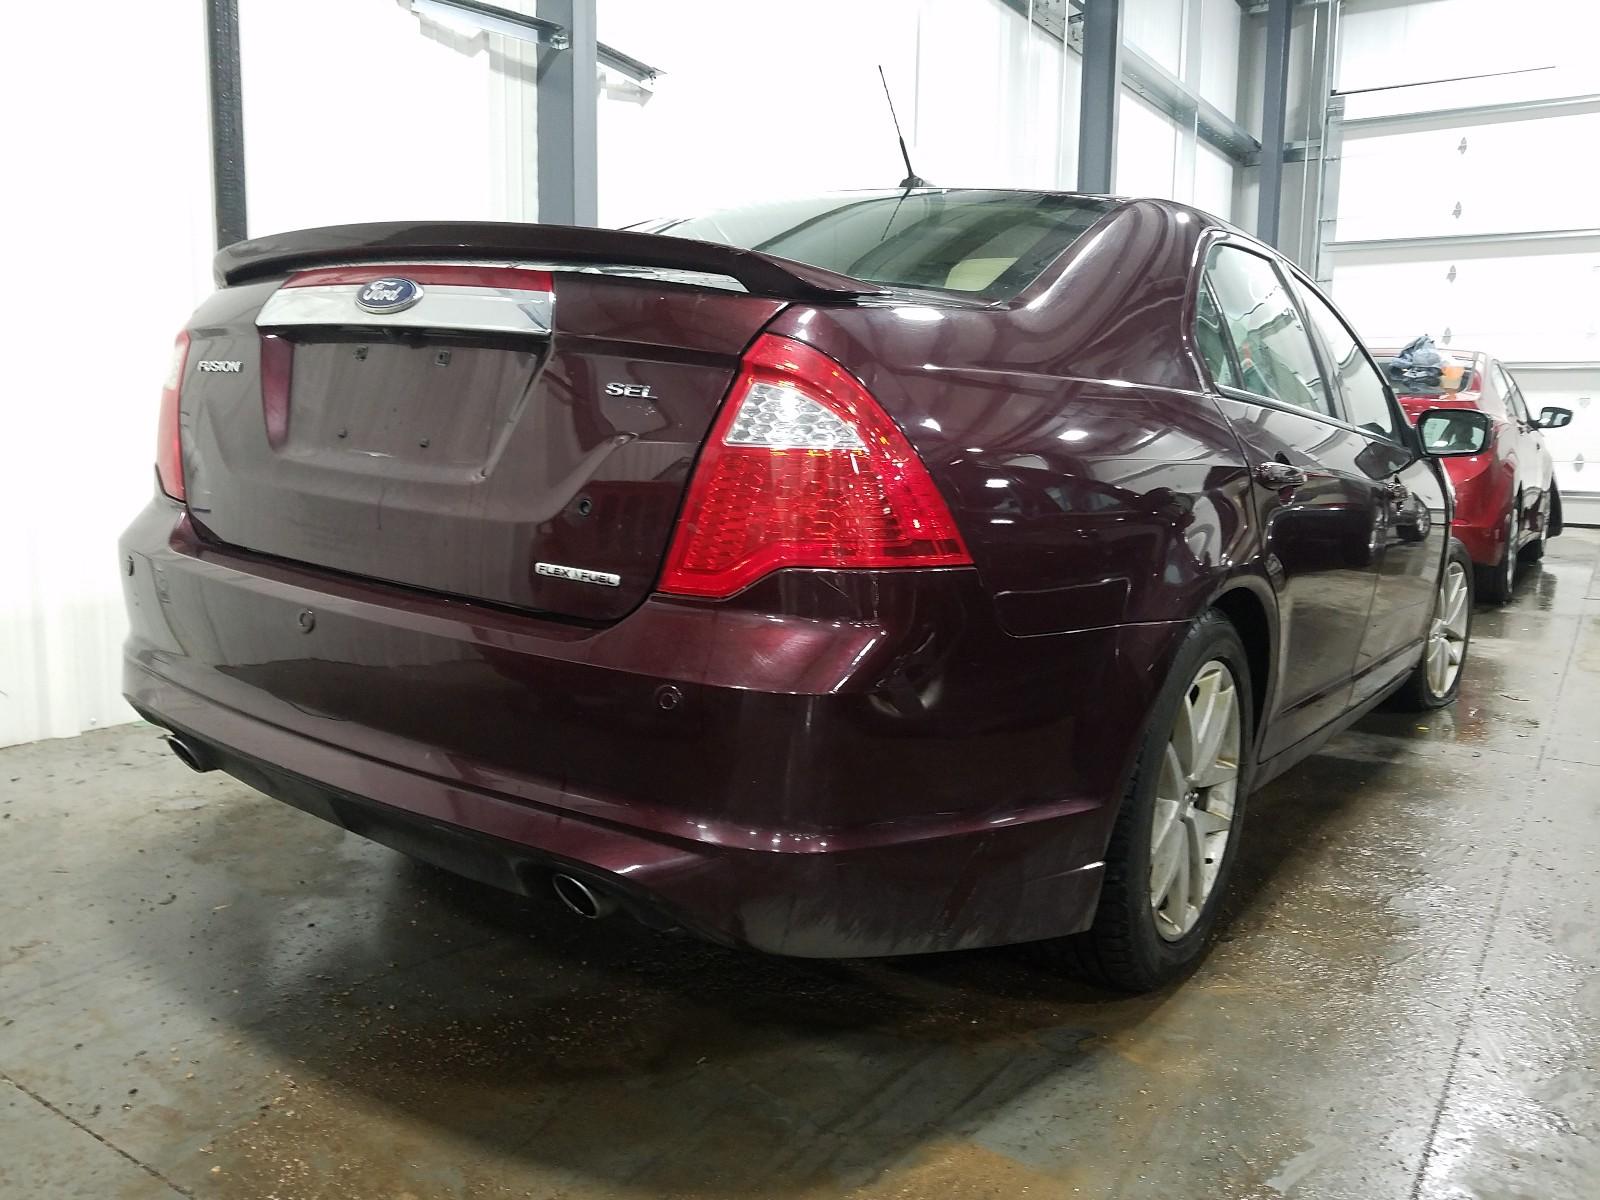 3FAHP0CG6CR288298 - 2012 Ford Fusion Sel 3.0L rear view